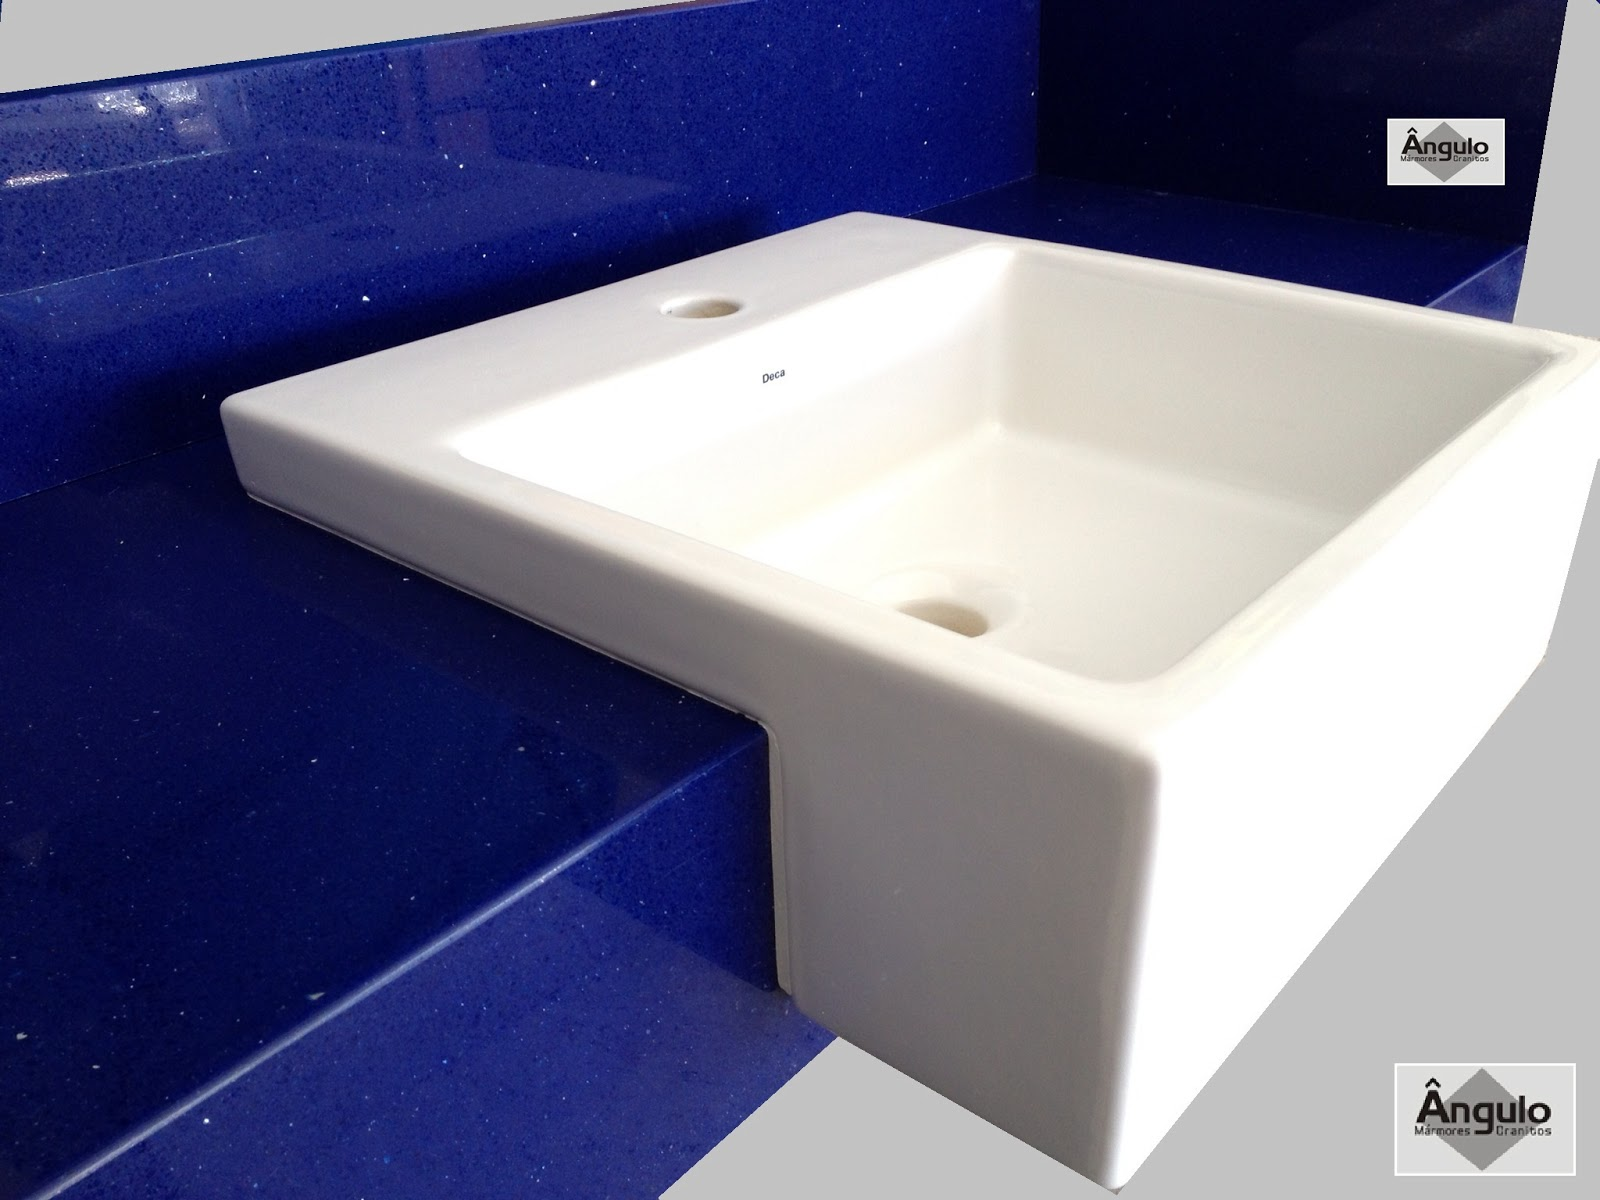 Ângulo Mármores e Granitos: Silestone Azul Stellar #070938 1600x1200 Bancada Banheiro Silestone